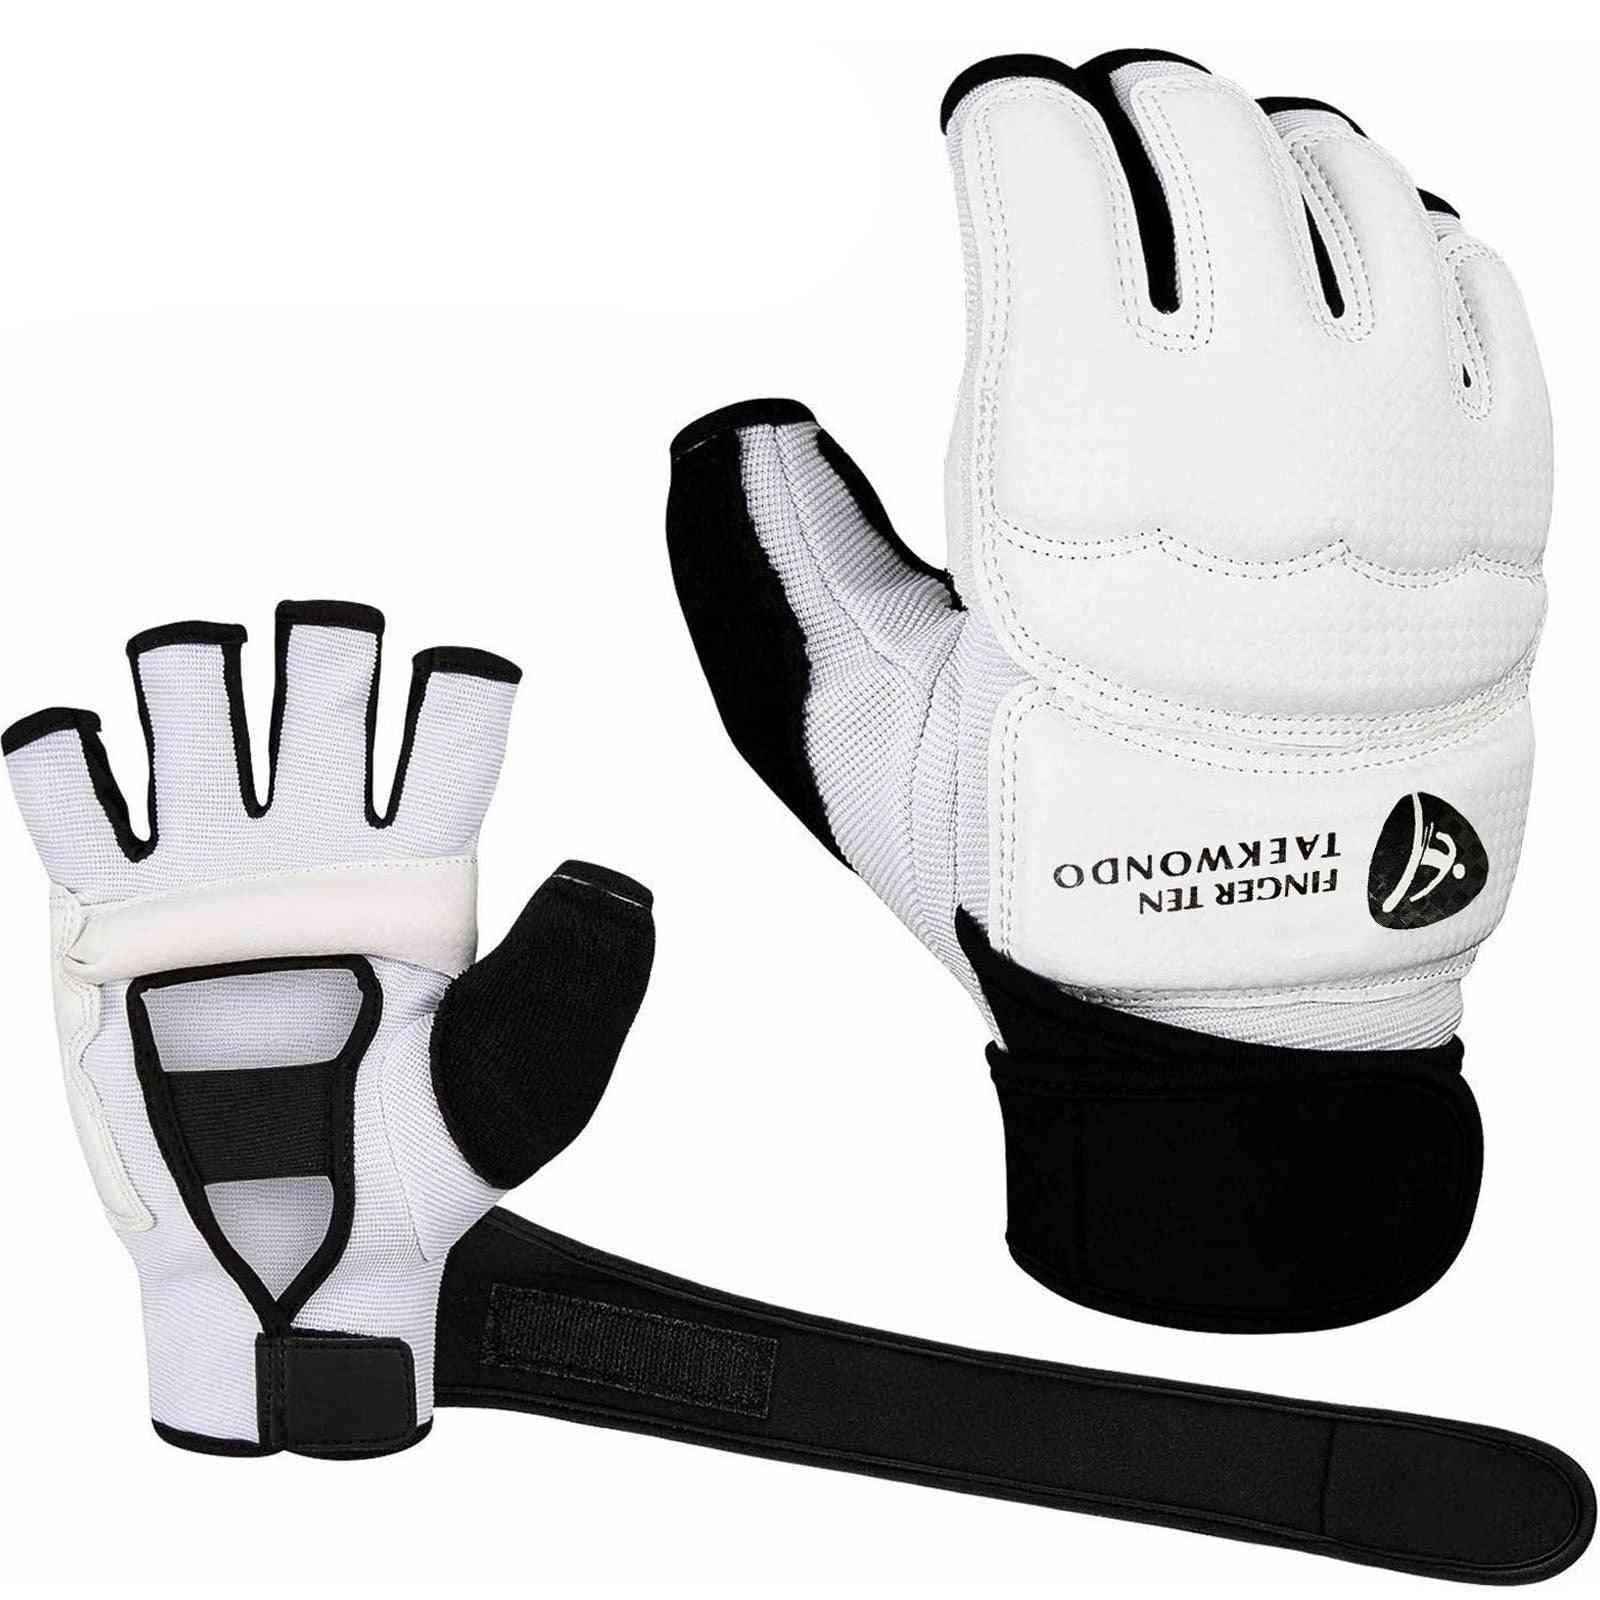 Pro Punching Half Finger Boxing Gloves